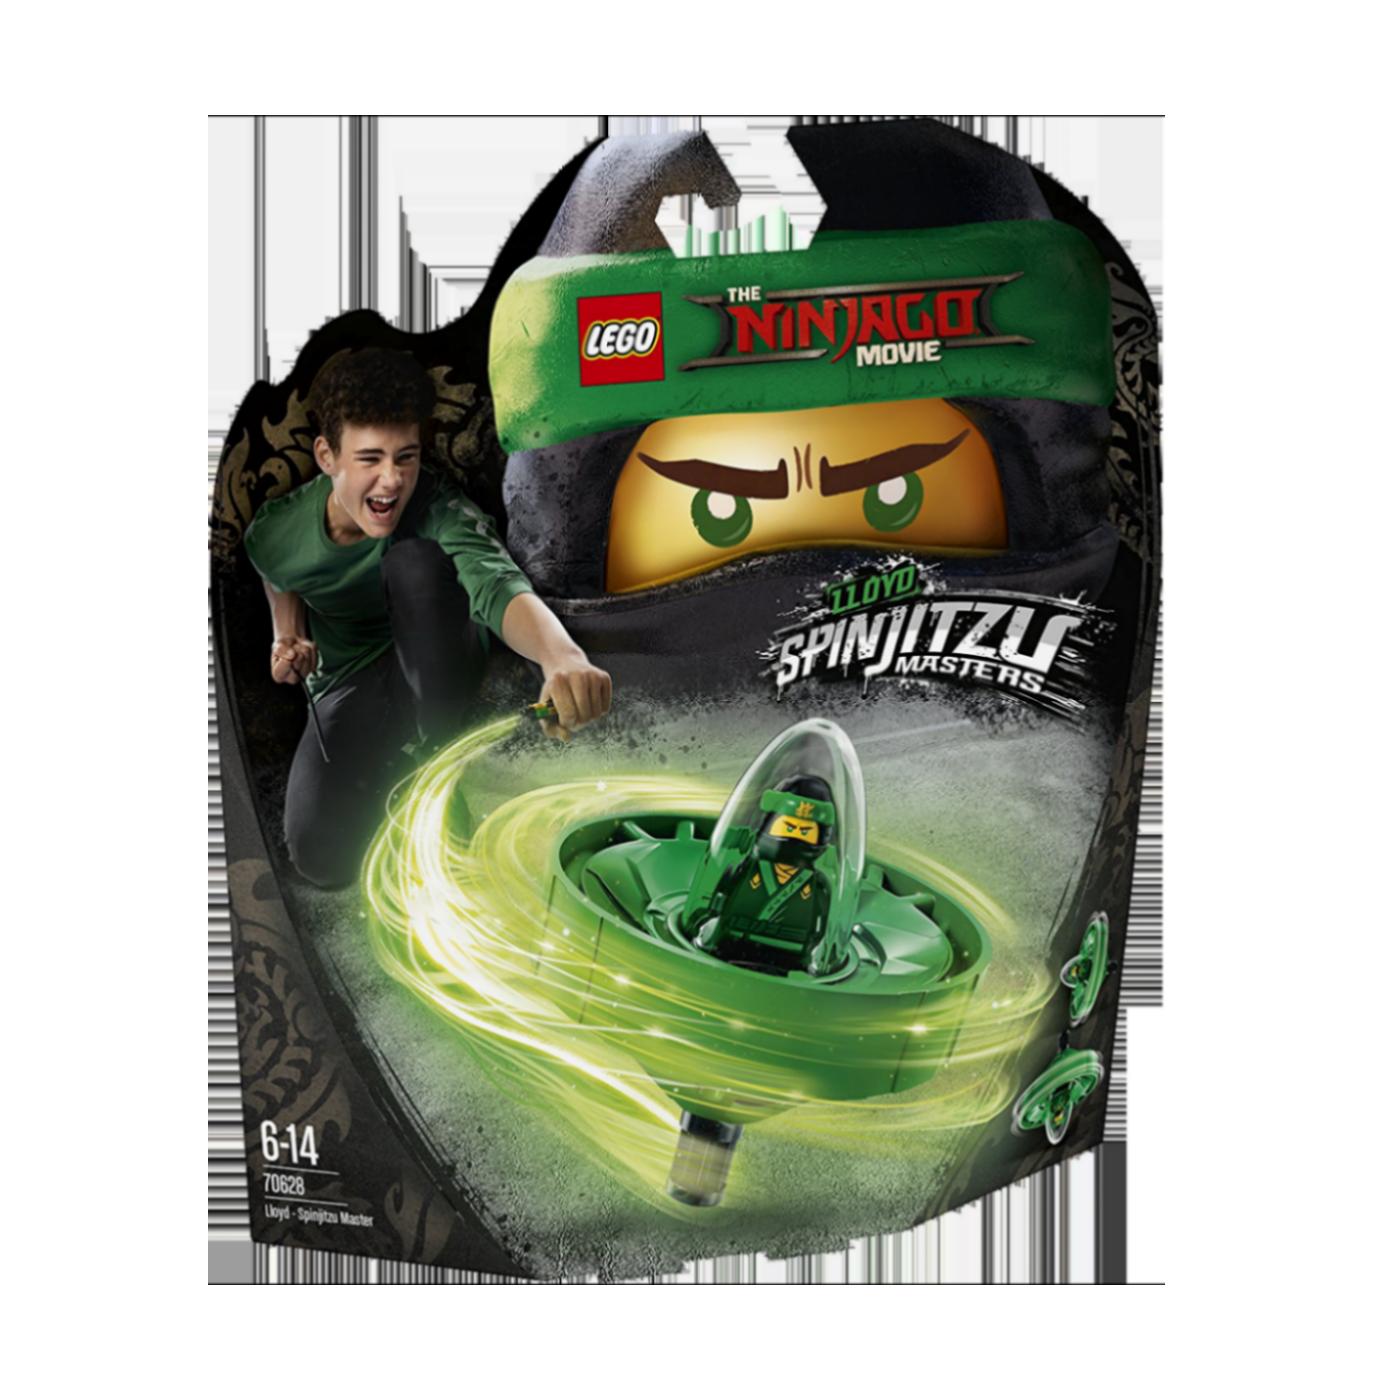 Lloyd - Spinjitzu Master, LEGO Ninjago Movie